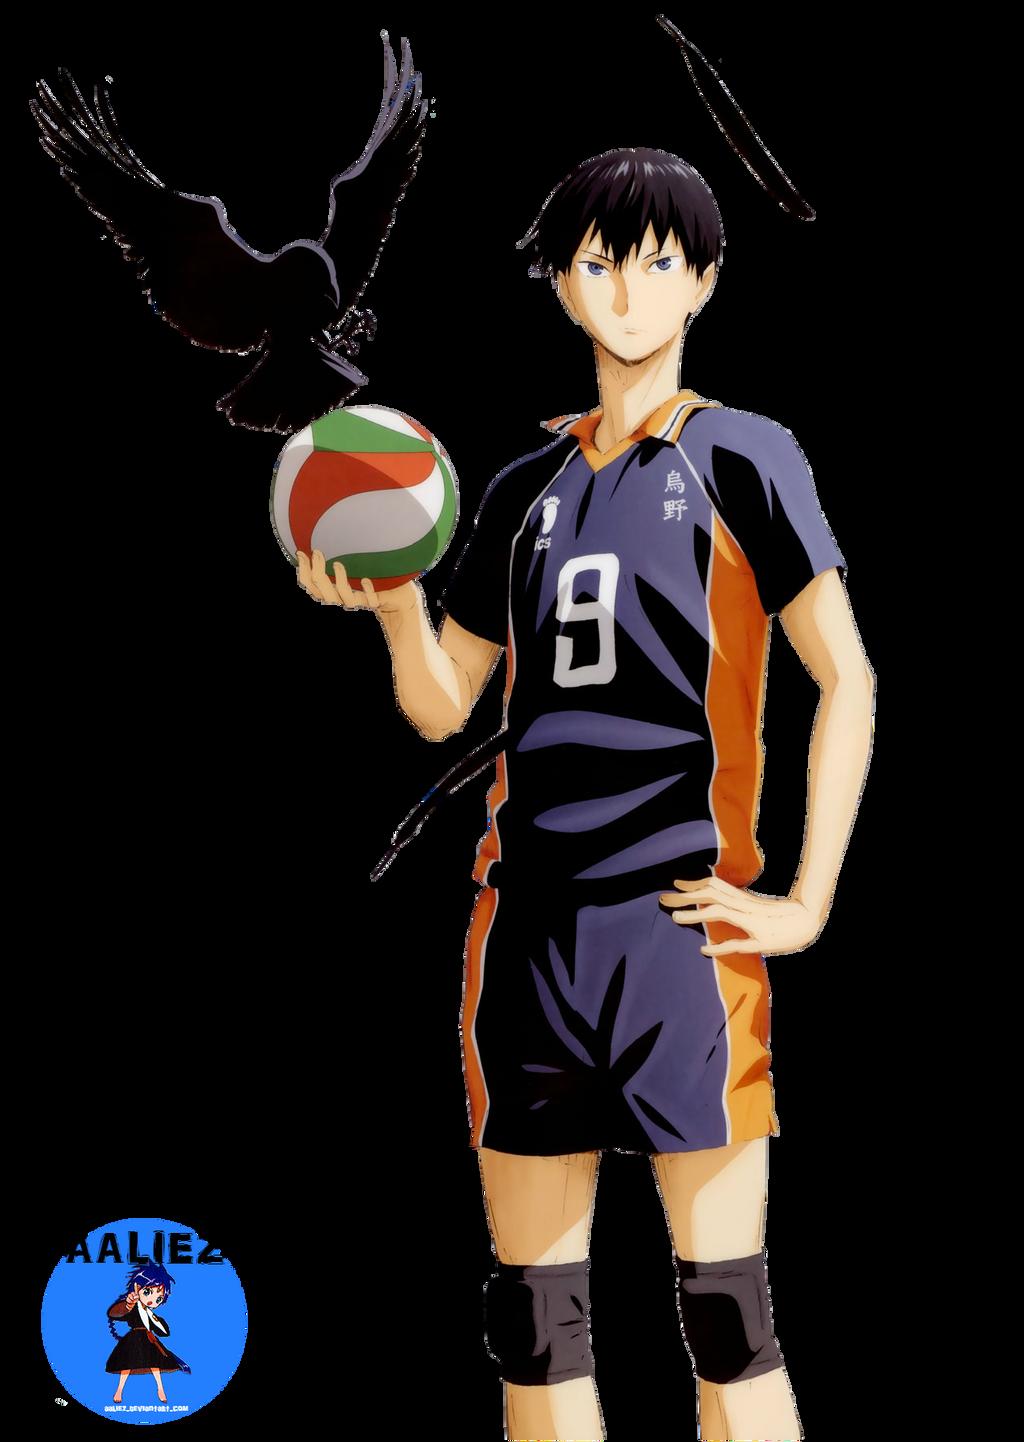 how tall is kageyama tobio